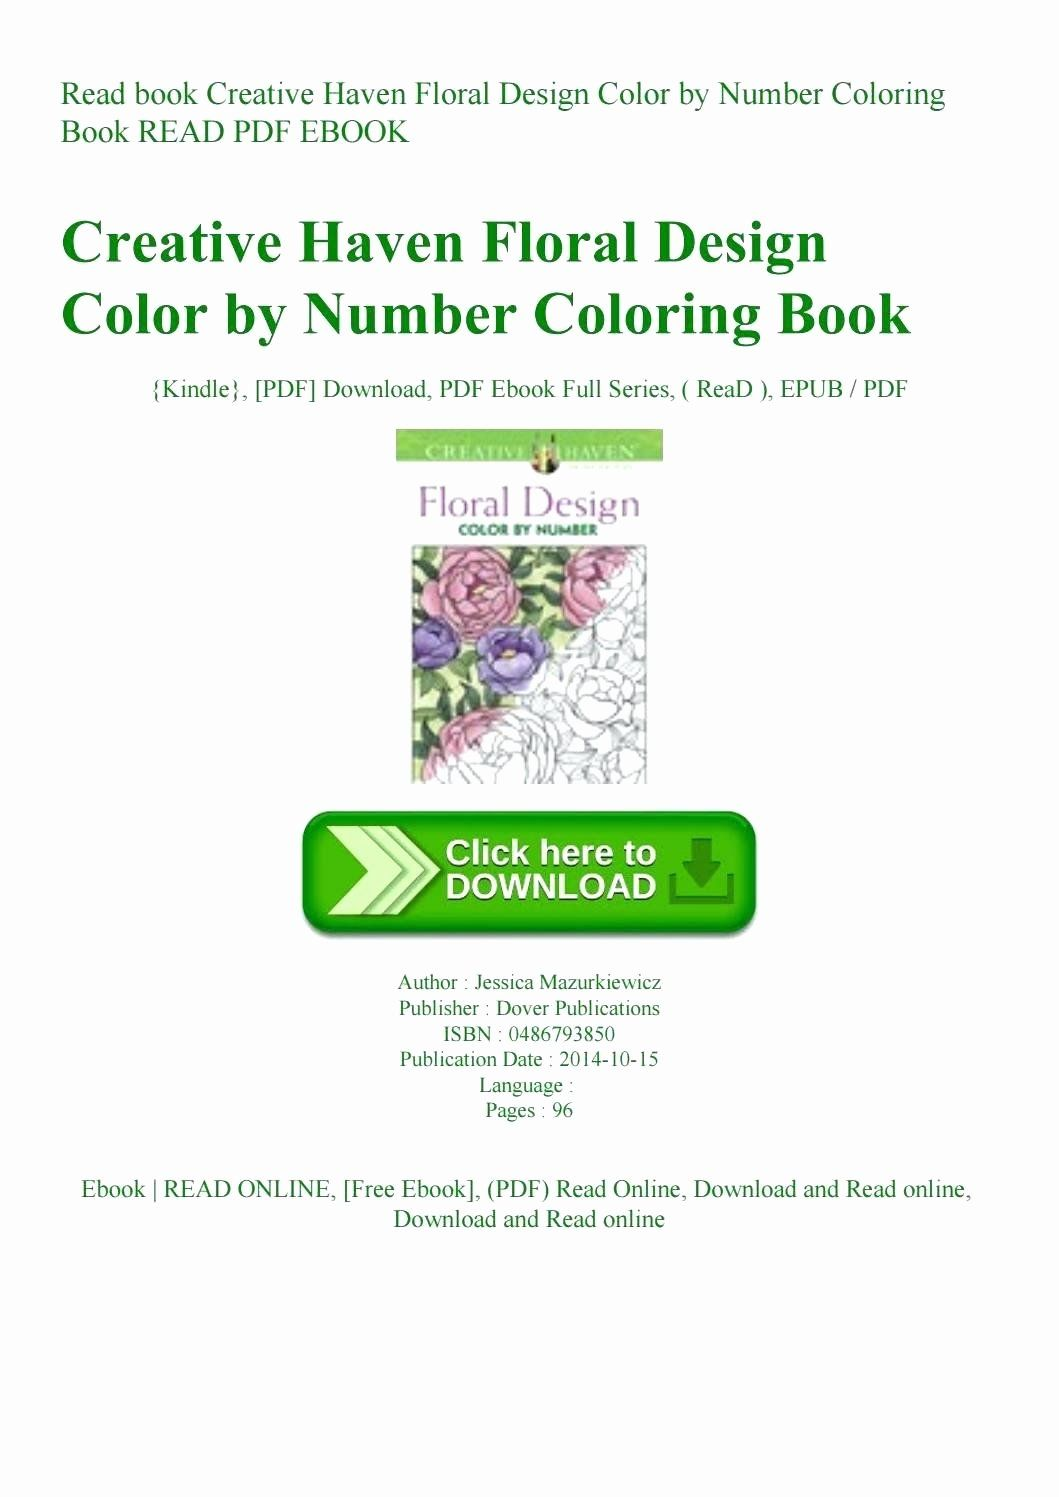 Chromatic Number In Coloring Elegant Exact Coloring Tree Coloring Page Coloring Pages Color